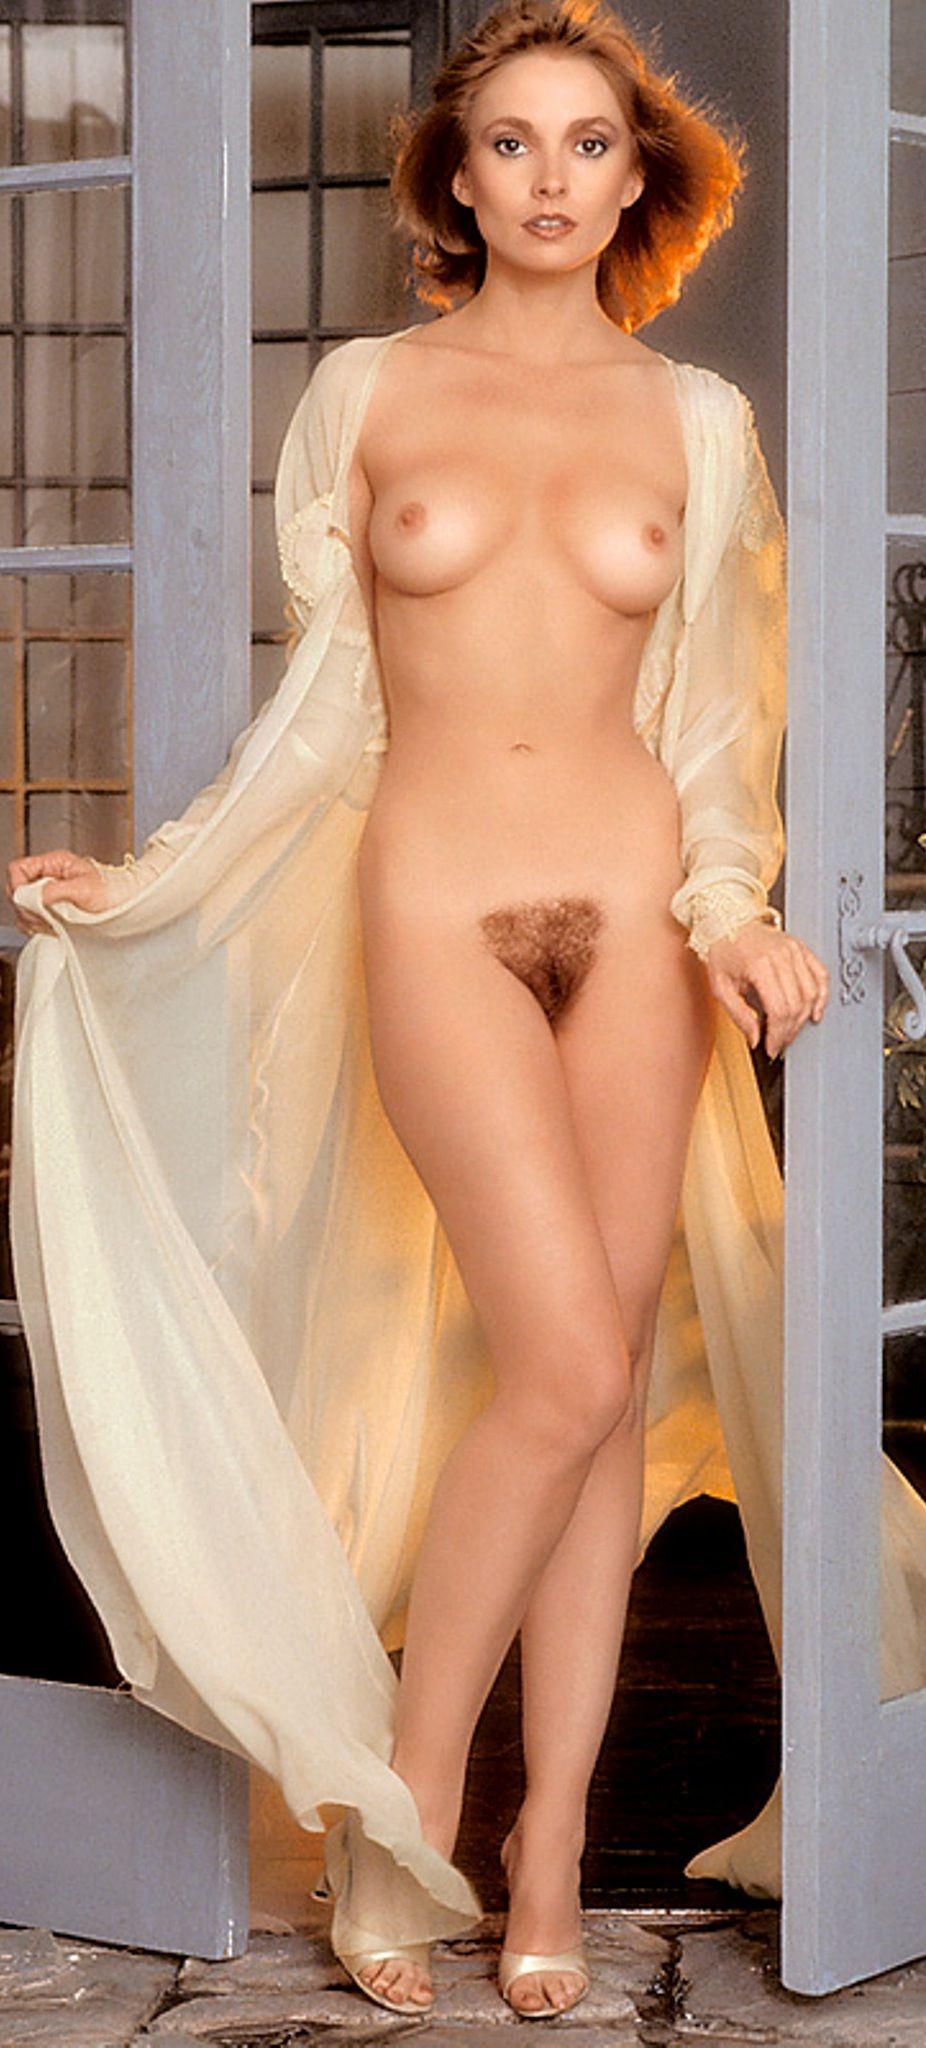 Cindi wood nude